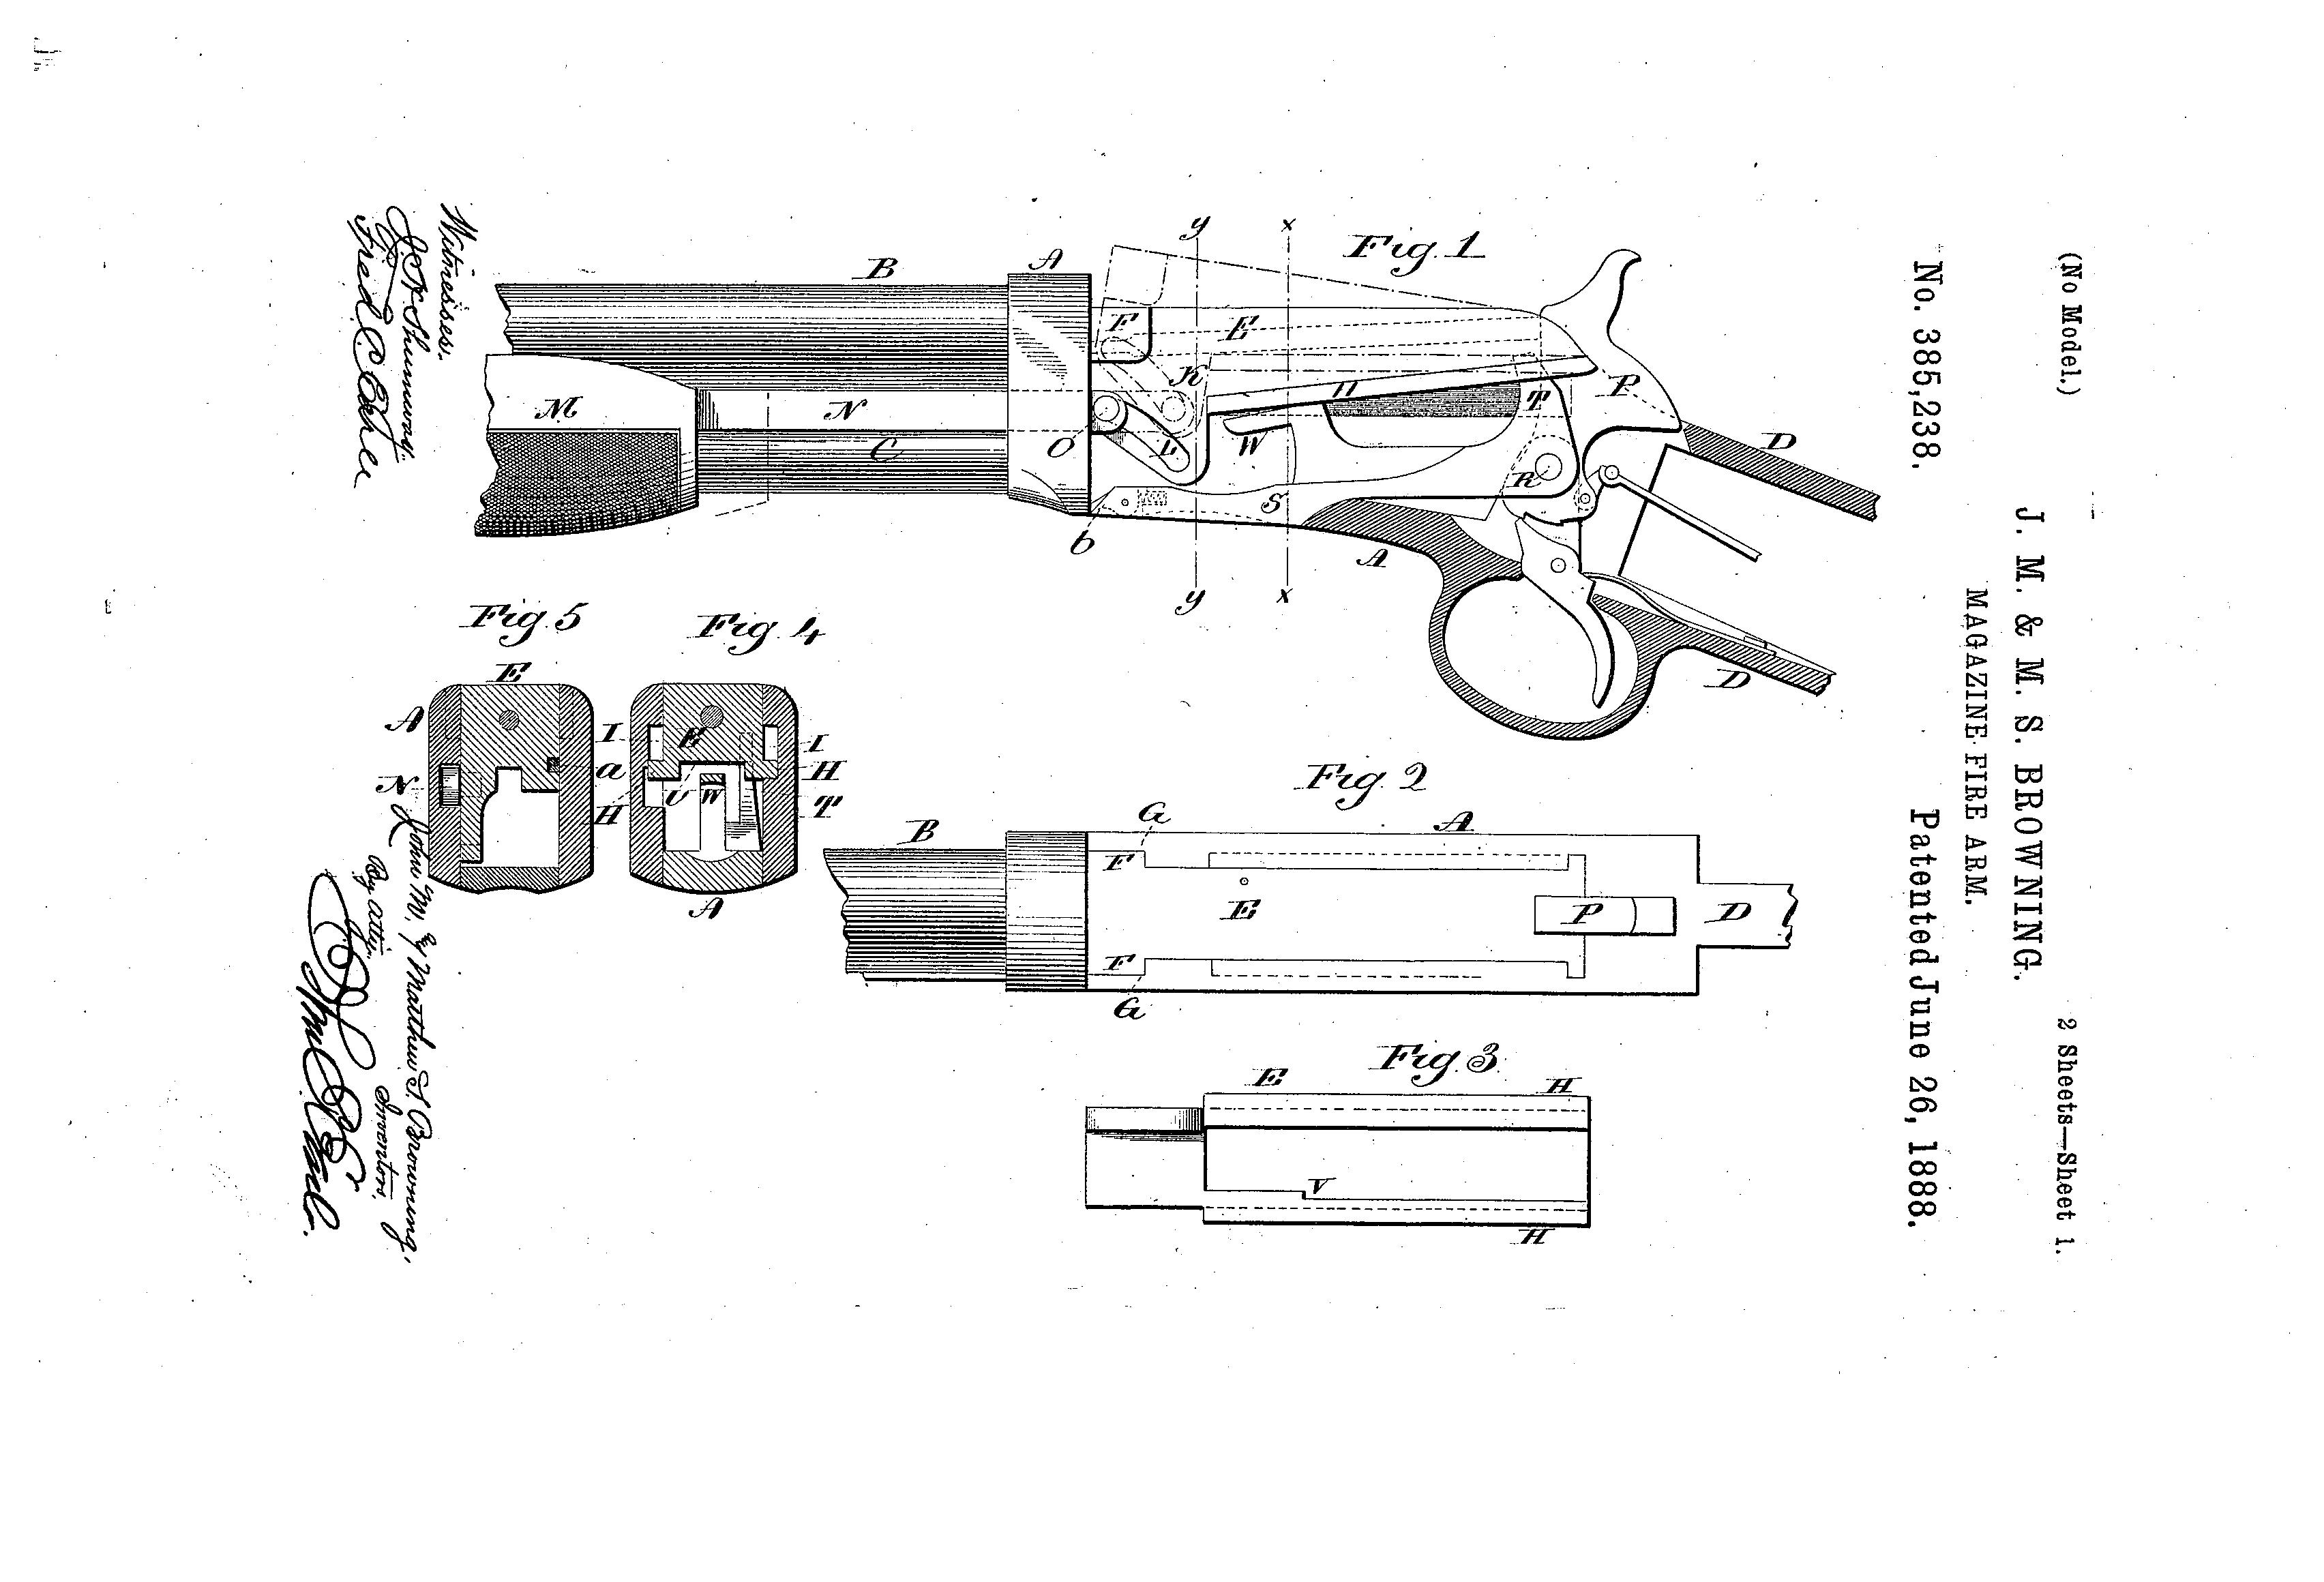 US385238-0